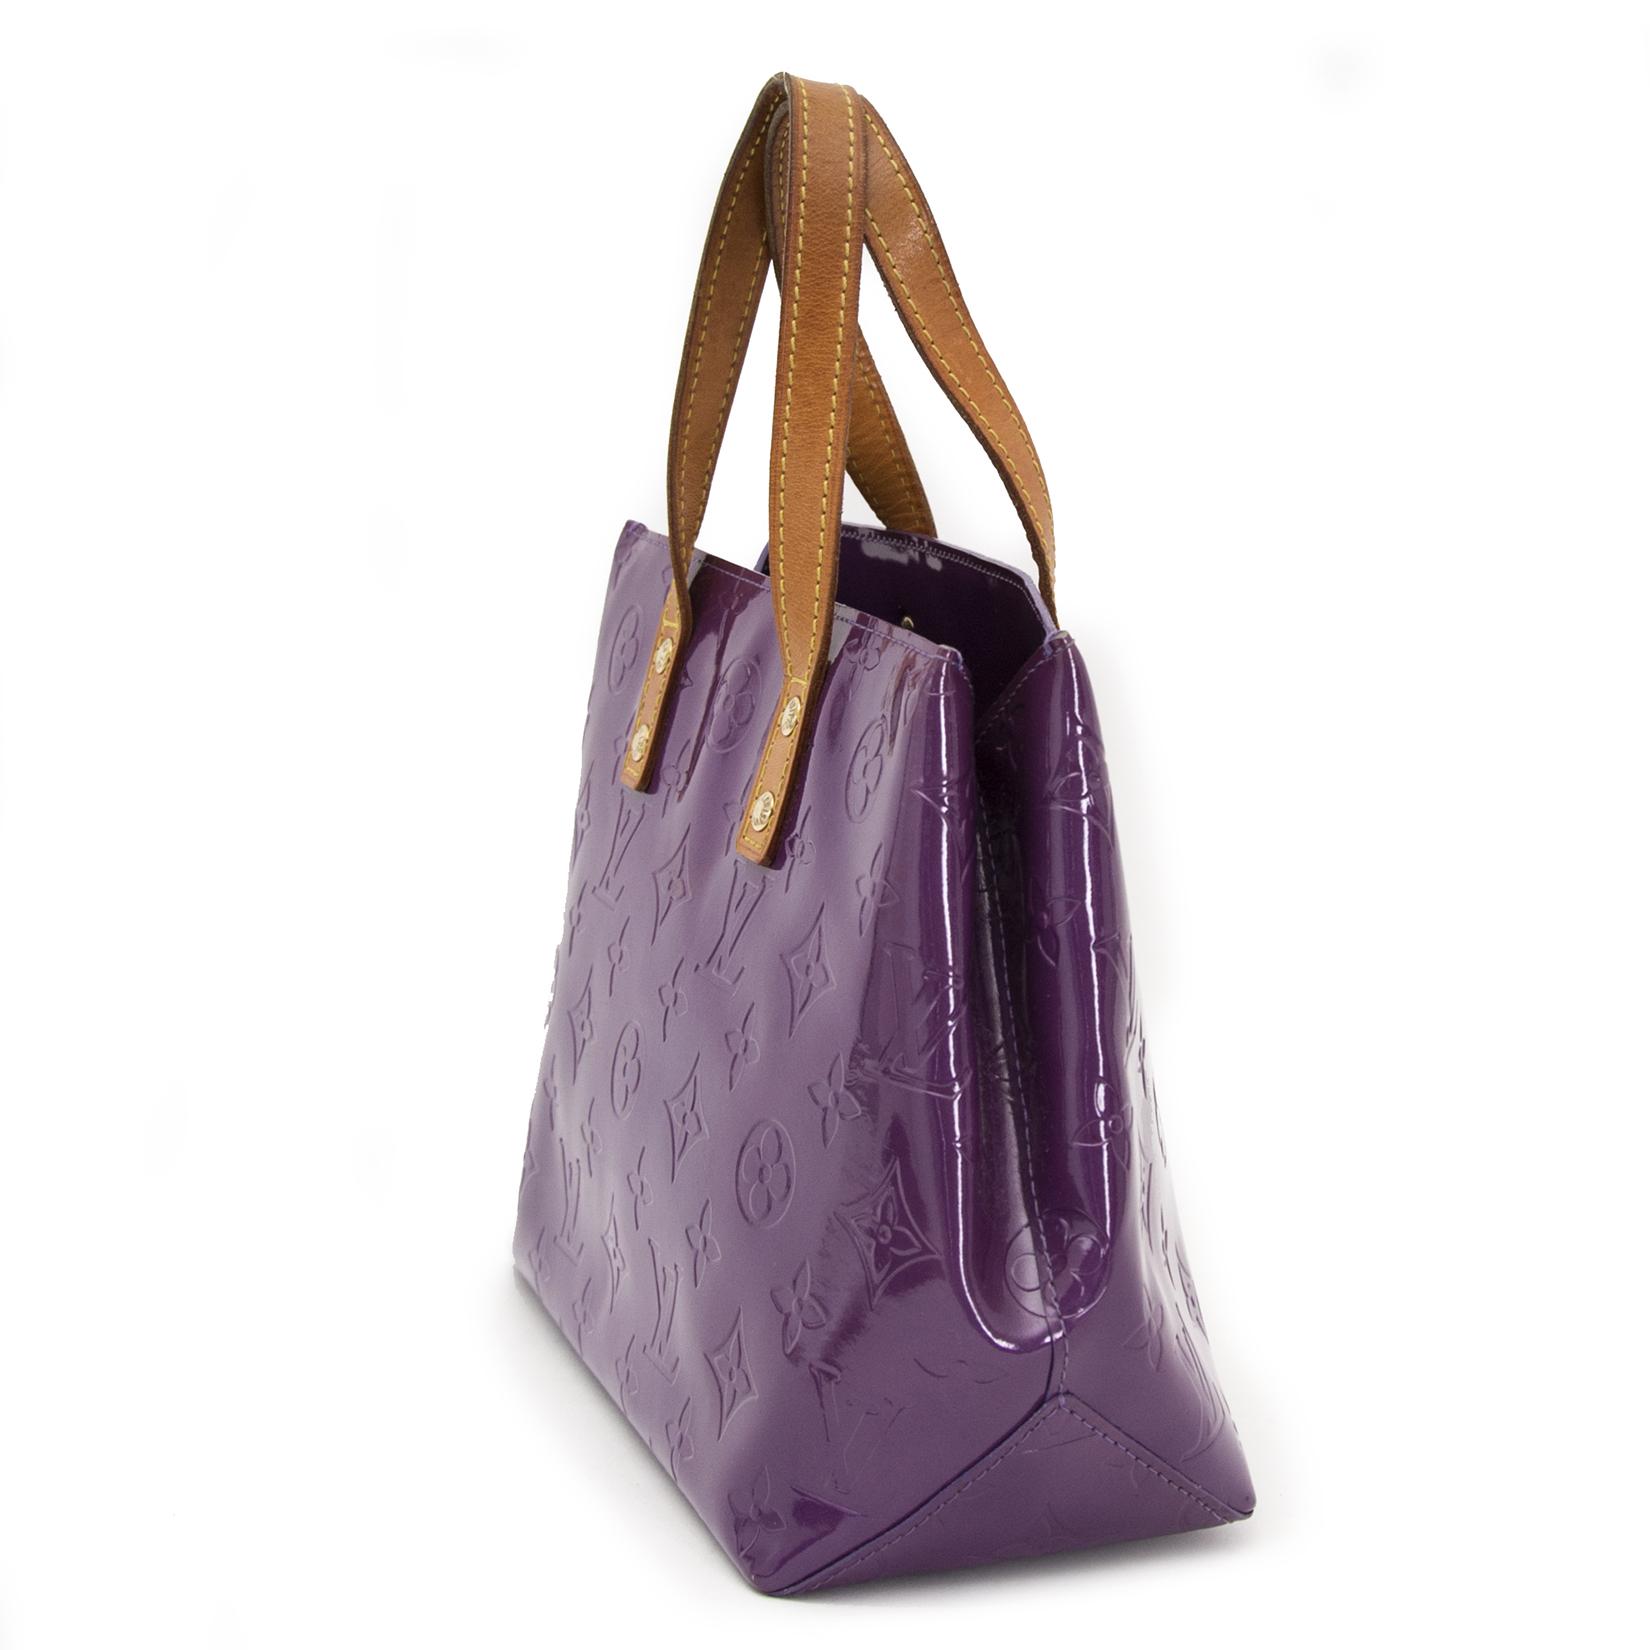 looking for a secondhand Louis Vuitton Vernis Reade PM Violette Top Handle Bag